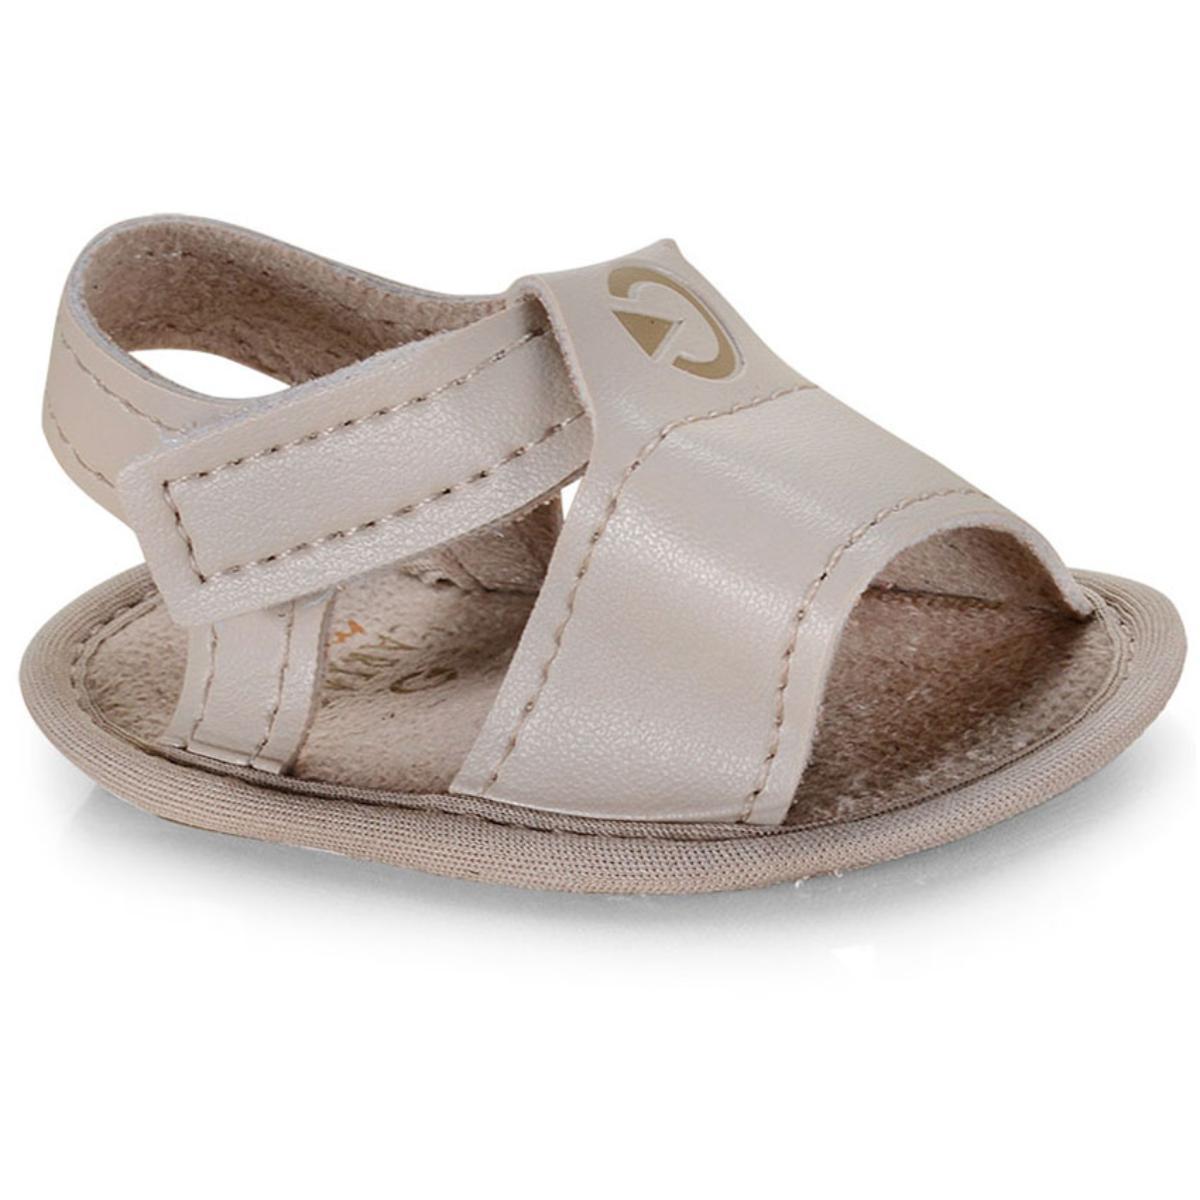 Sandália Masc Infantil Grendene 11537 20354 Cartago Mini rn Bege